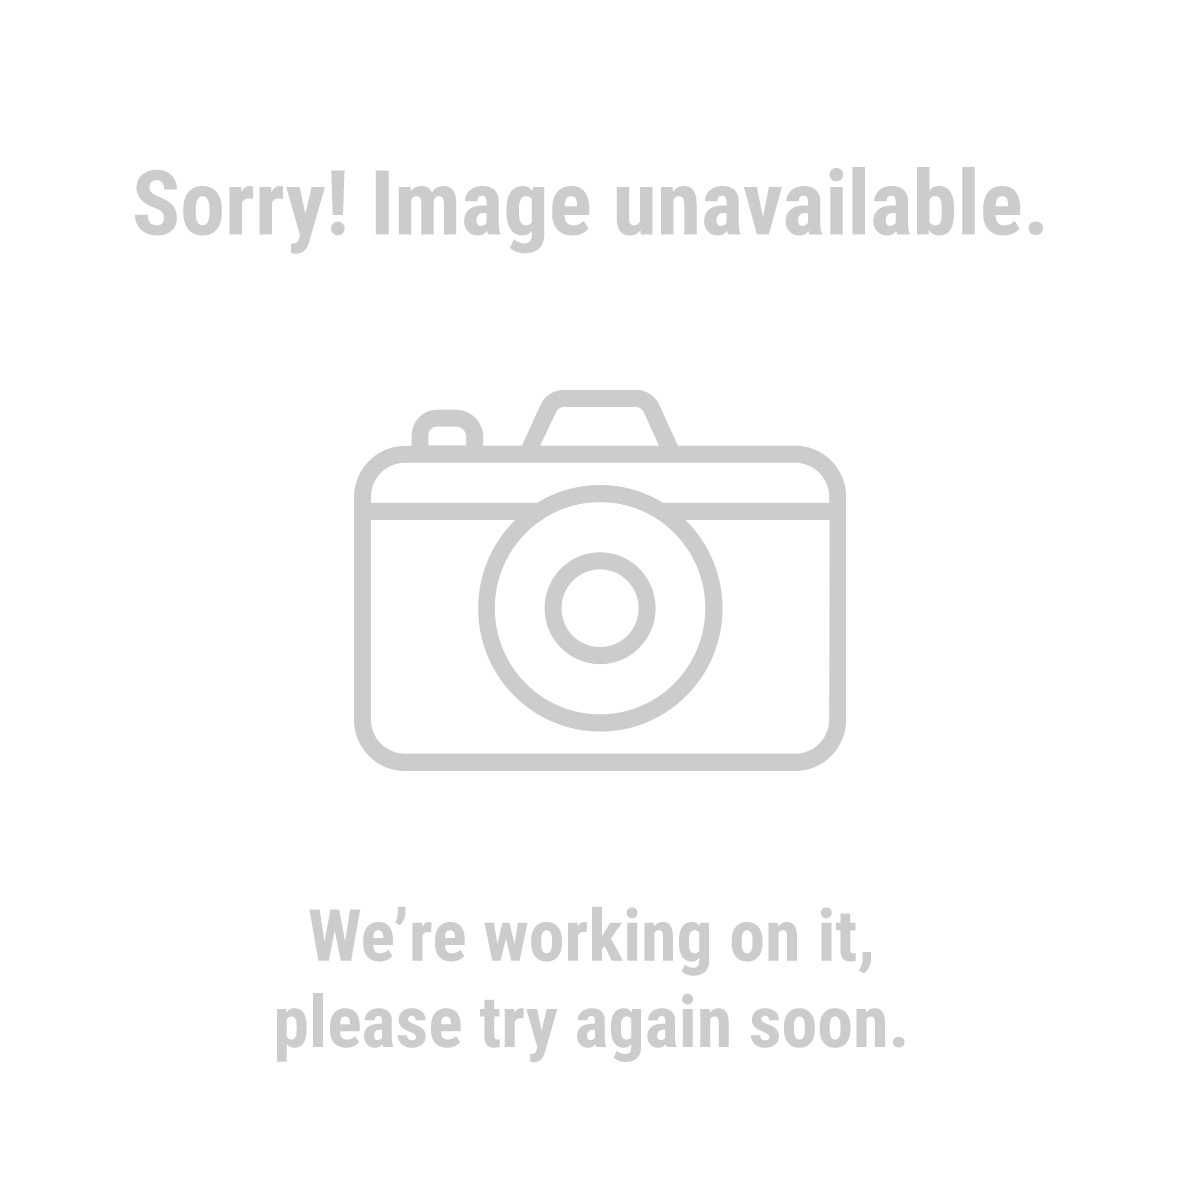 Central Pneumatic 67698 145 PSI 5 Horsepower Twin Cylinder Air Compressor Pump